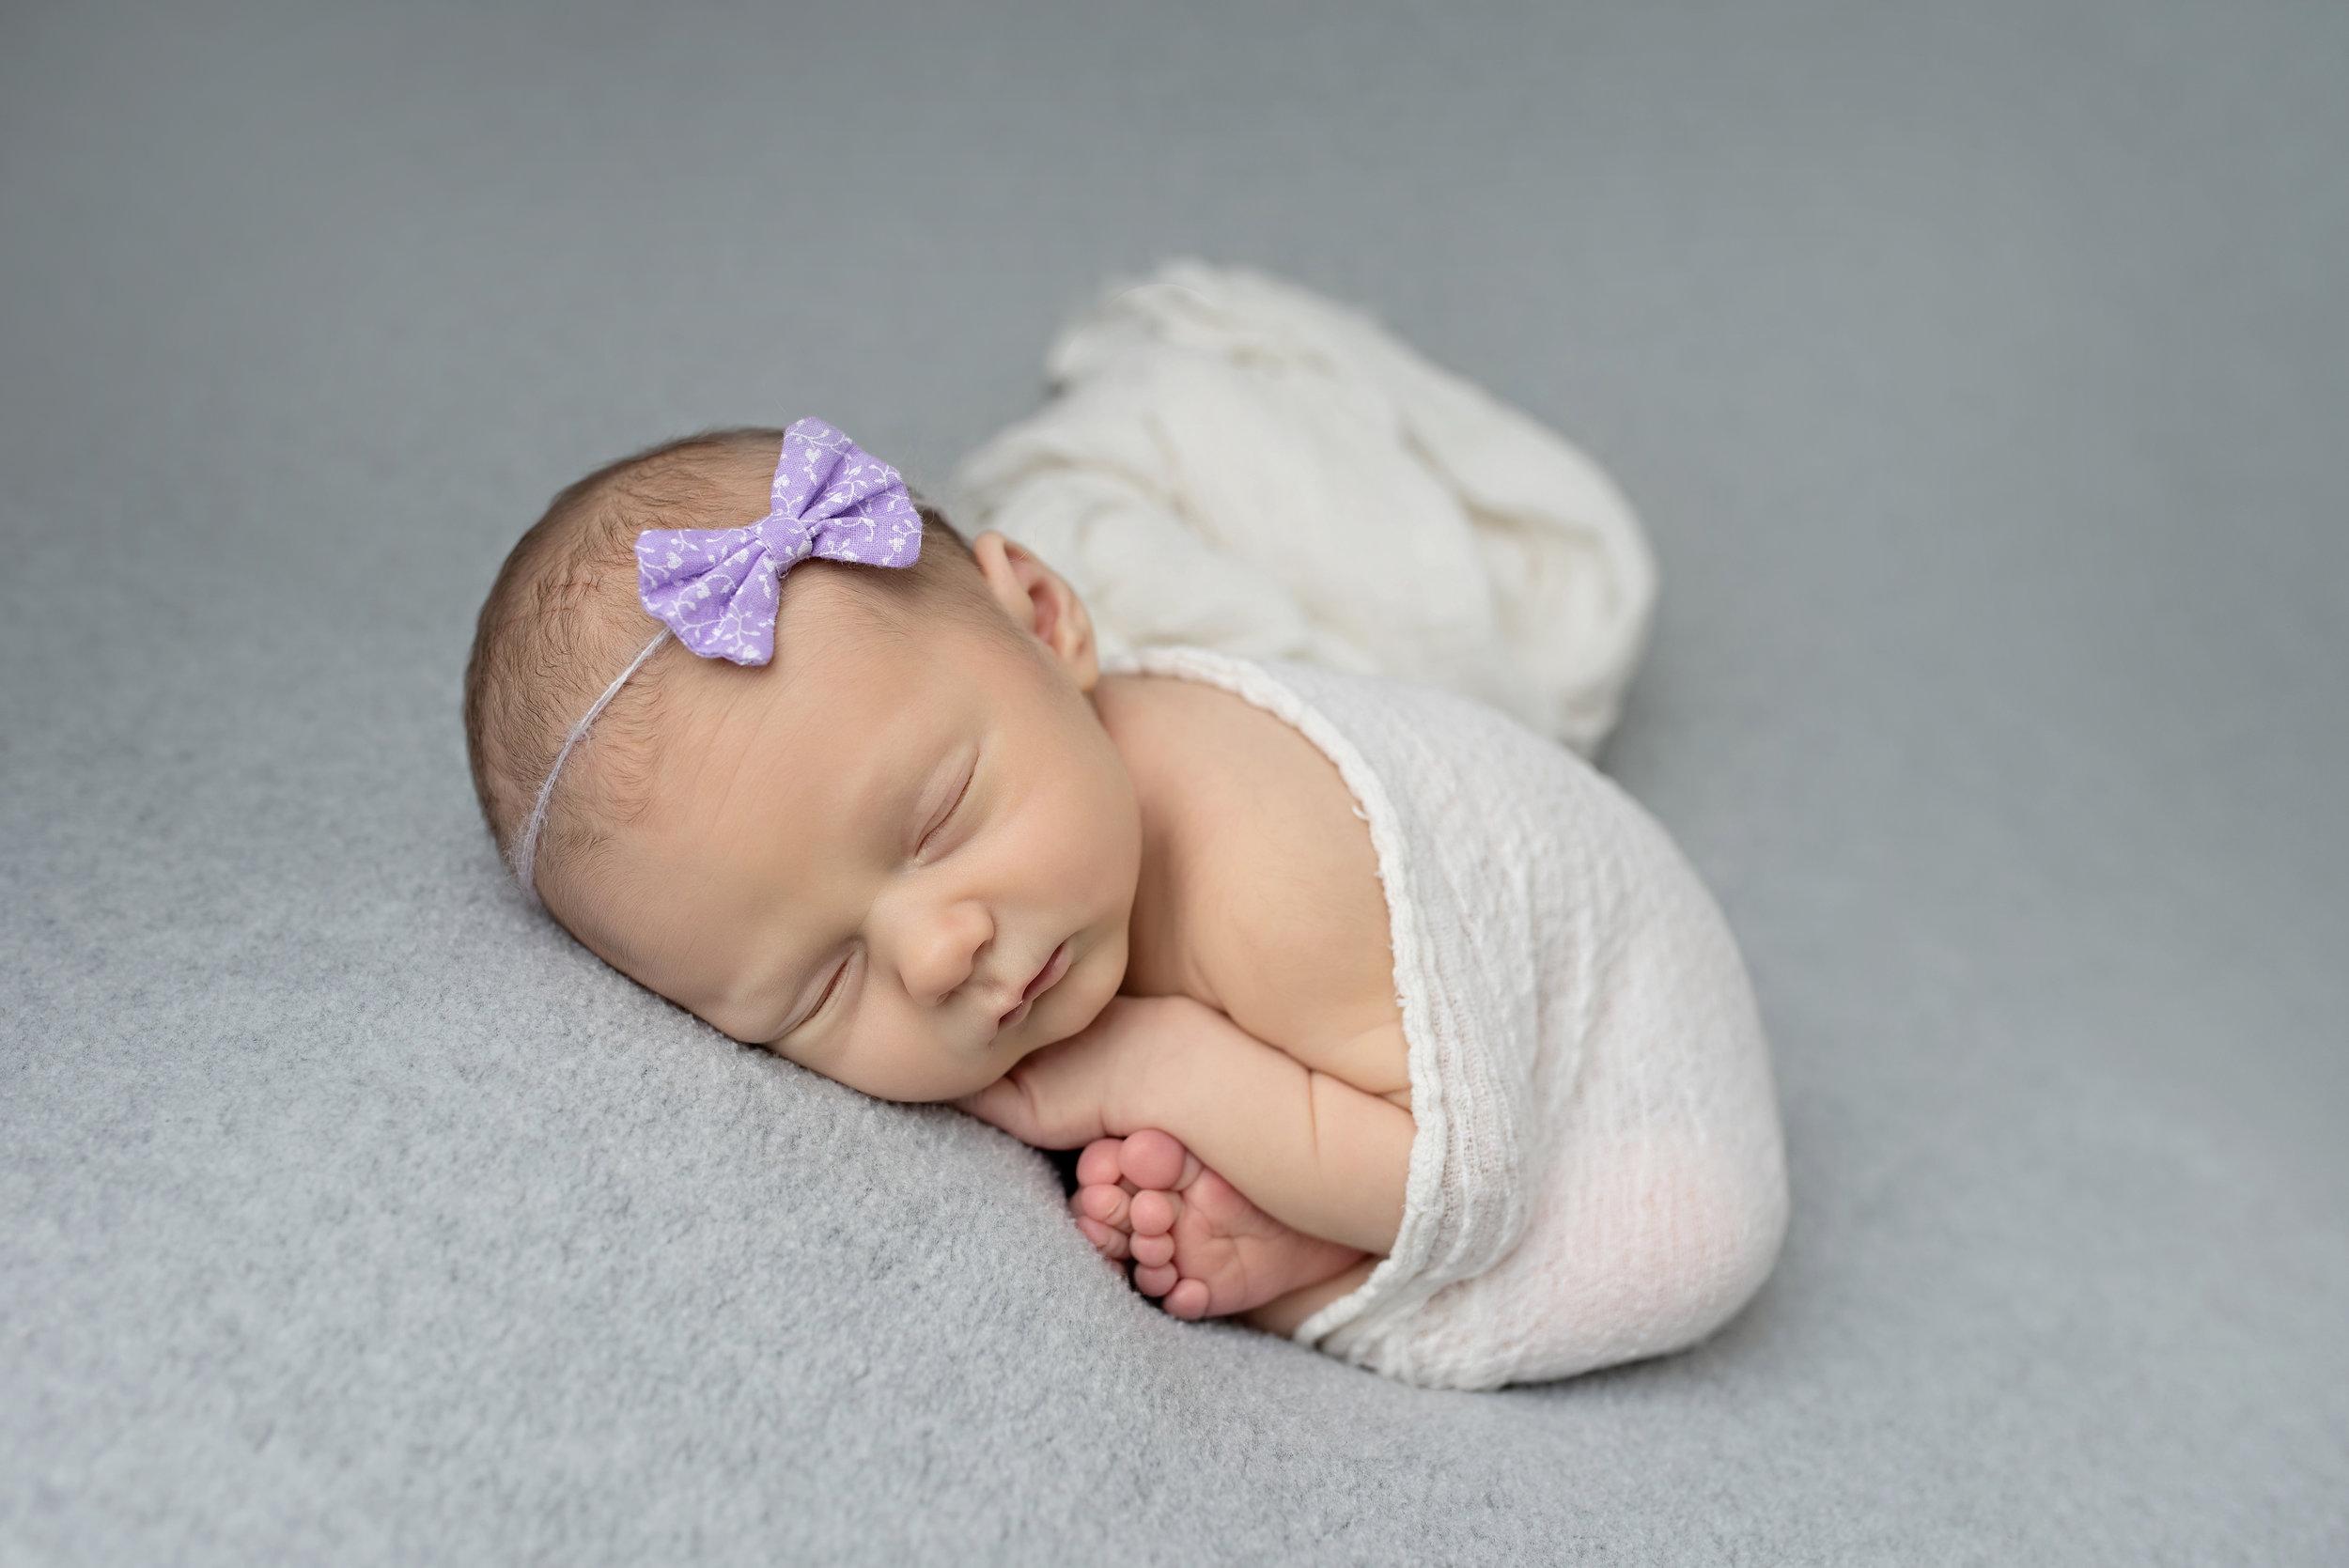 Titling/Alt Text/Description: 1. newborn photography jacksonville 2. newborn taco pose 3. bum up pose 4. newborn girl 5. baby toes 6. newborn photography